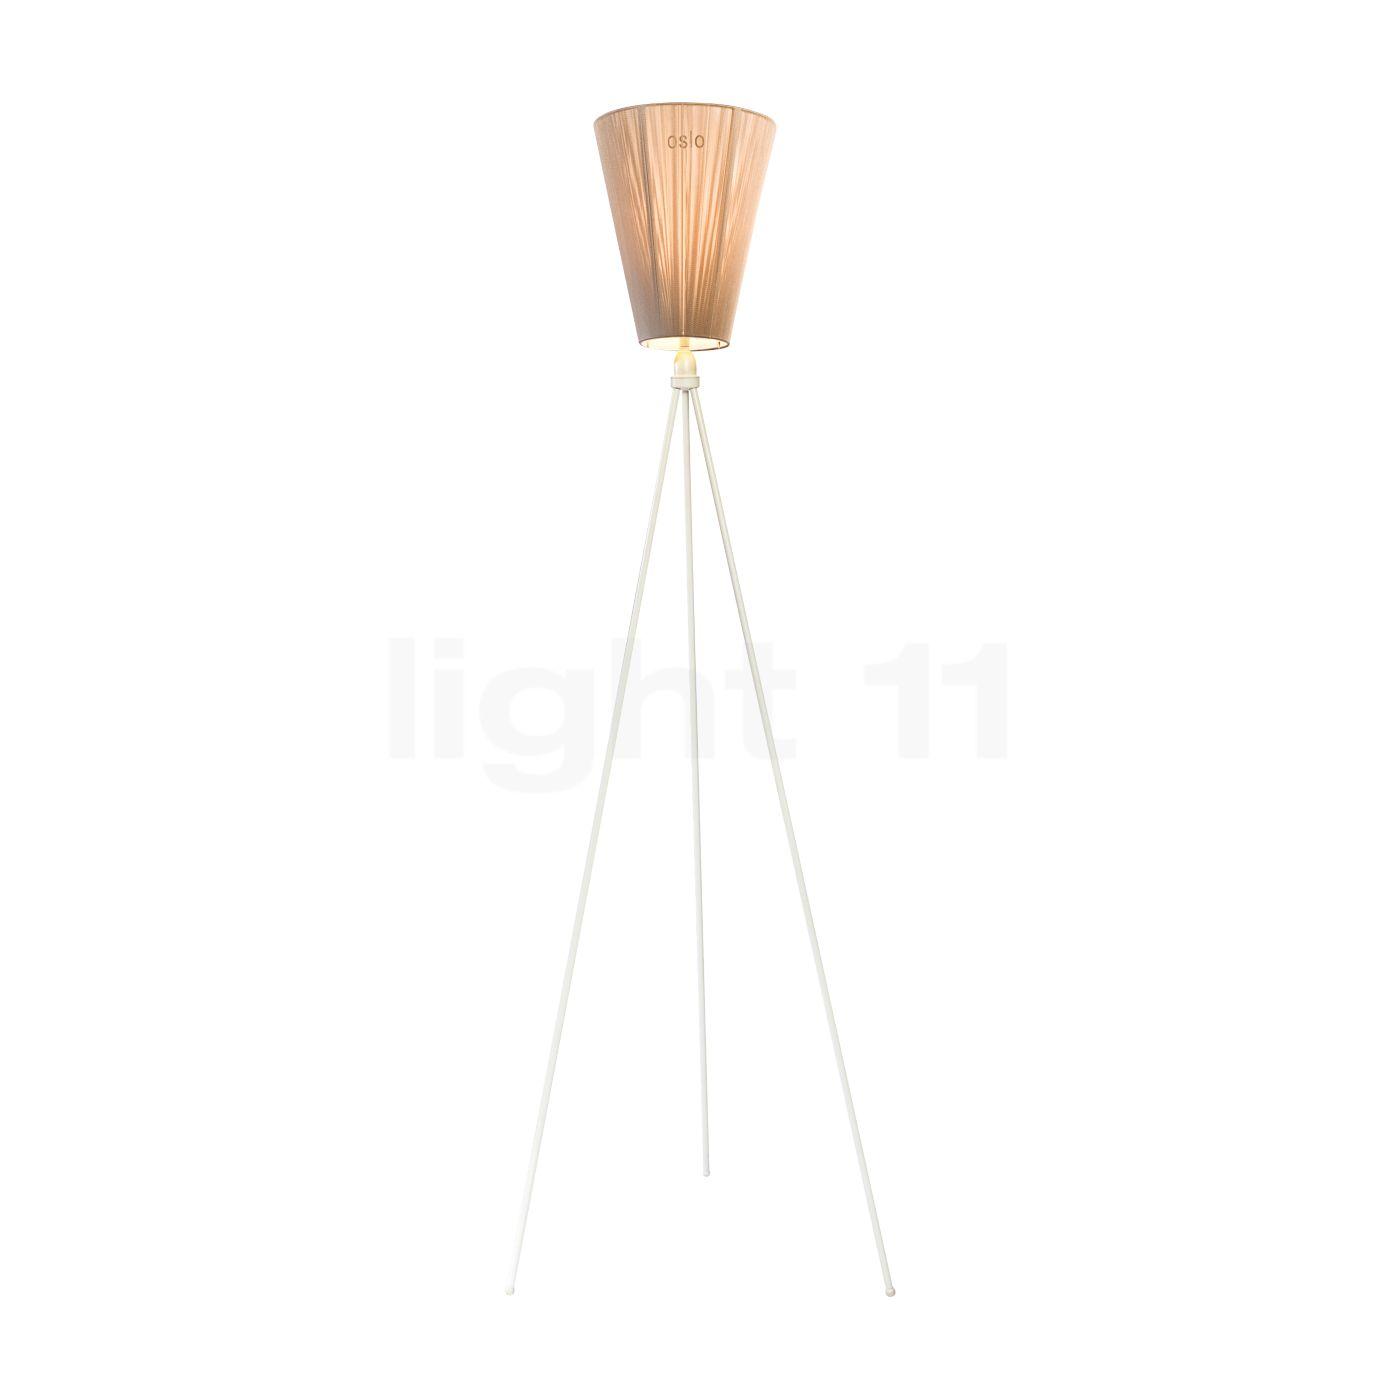 Northern oslo wood floor lamp floor lamps buy at light11 aloadofball Images